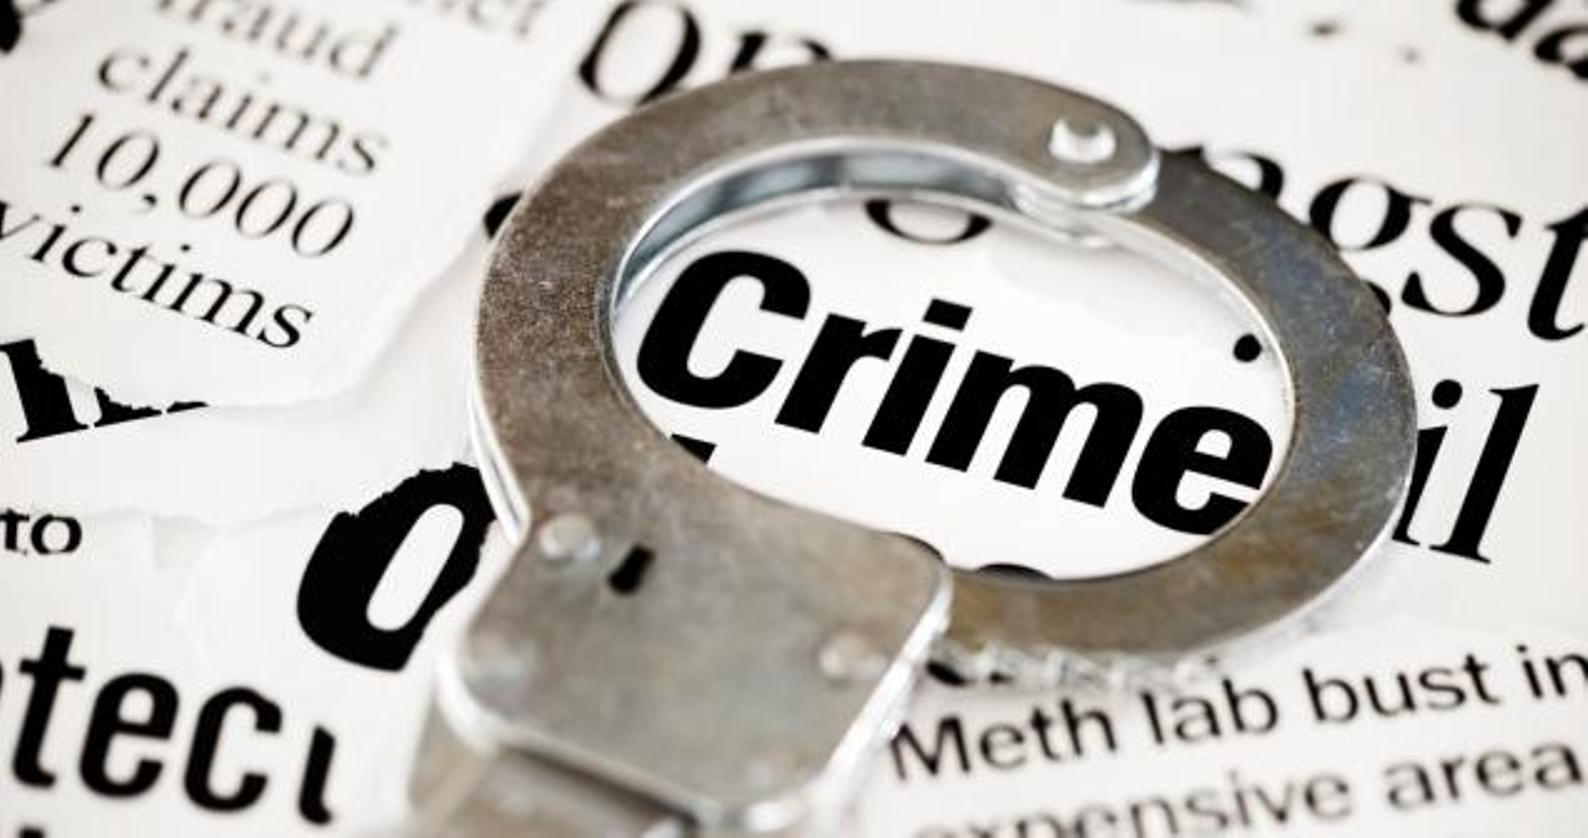 Police arrest 36 criminals, recover 14 guns in Rivers